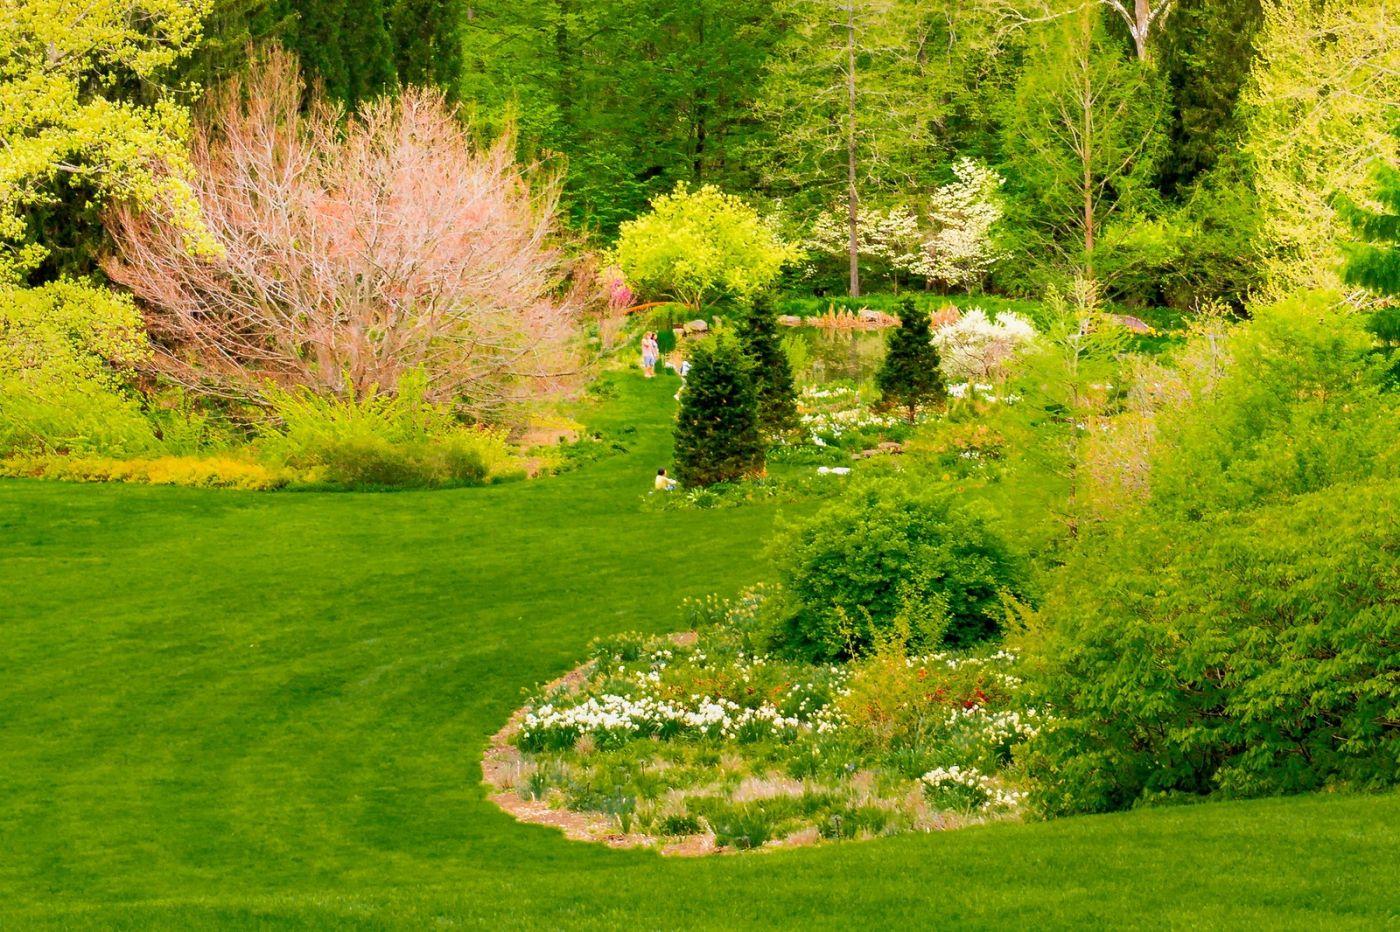 Chanticleer花园,融入自然_图1-12